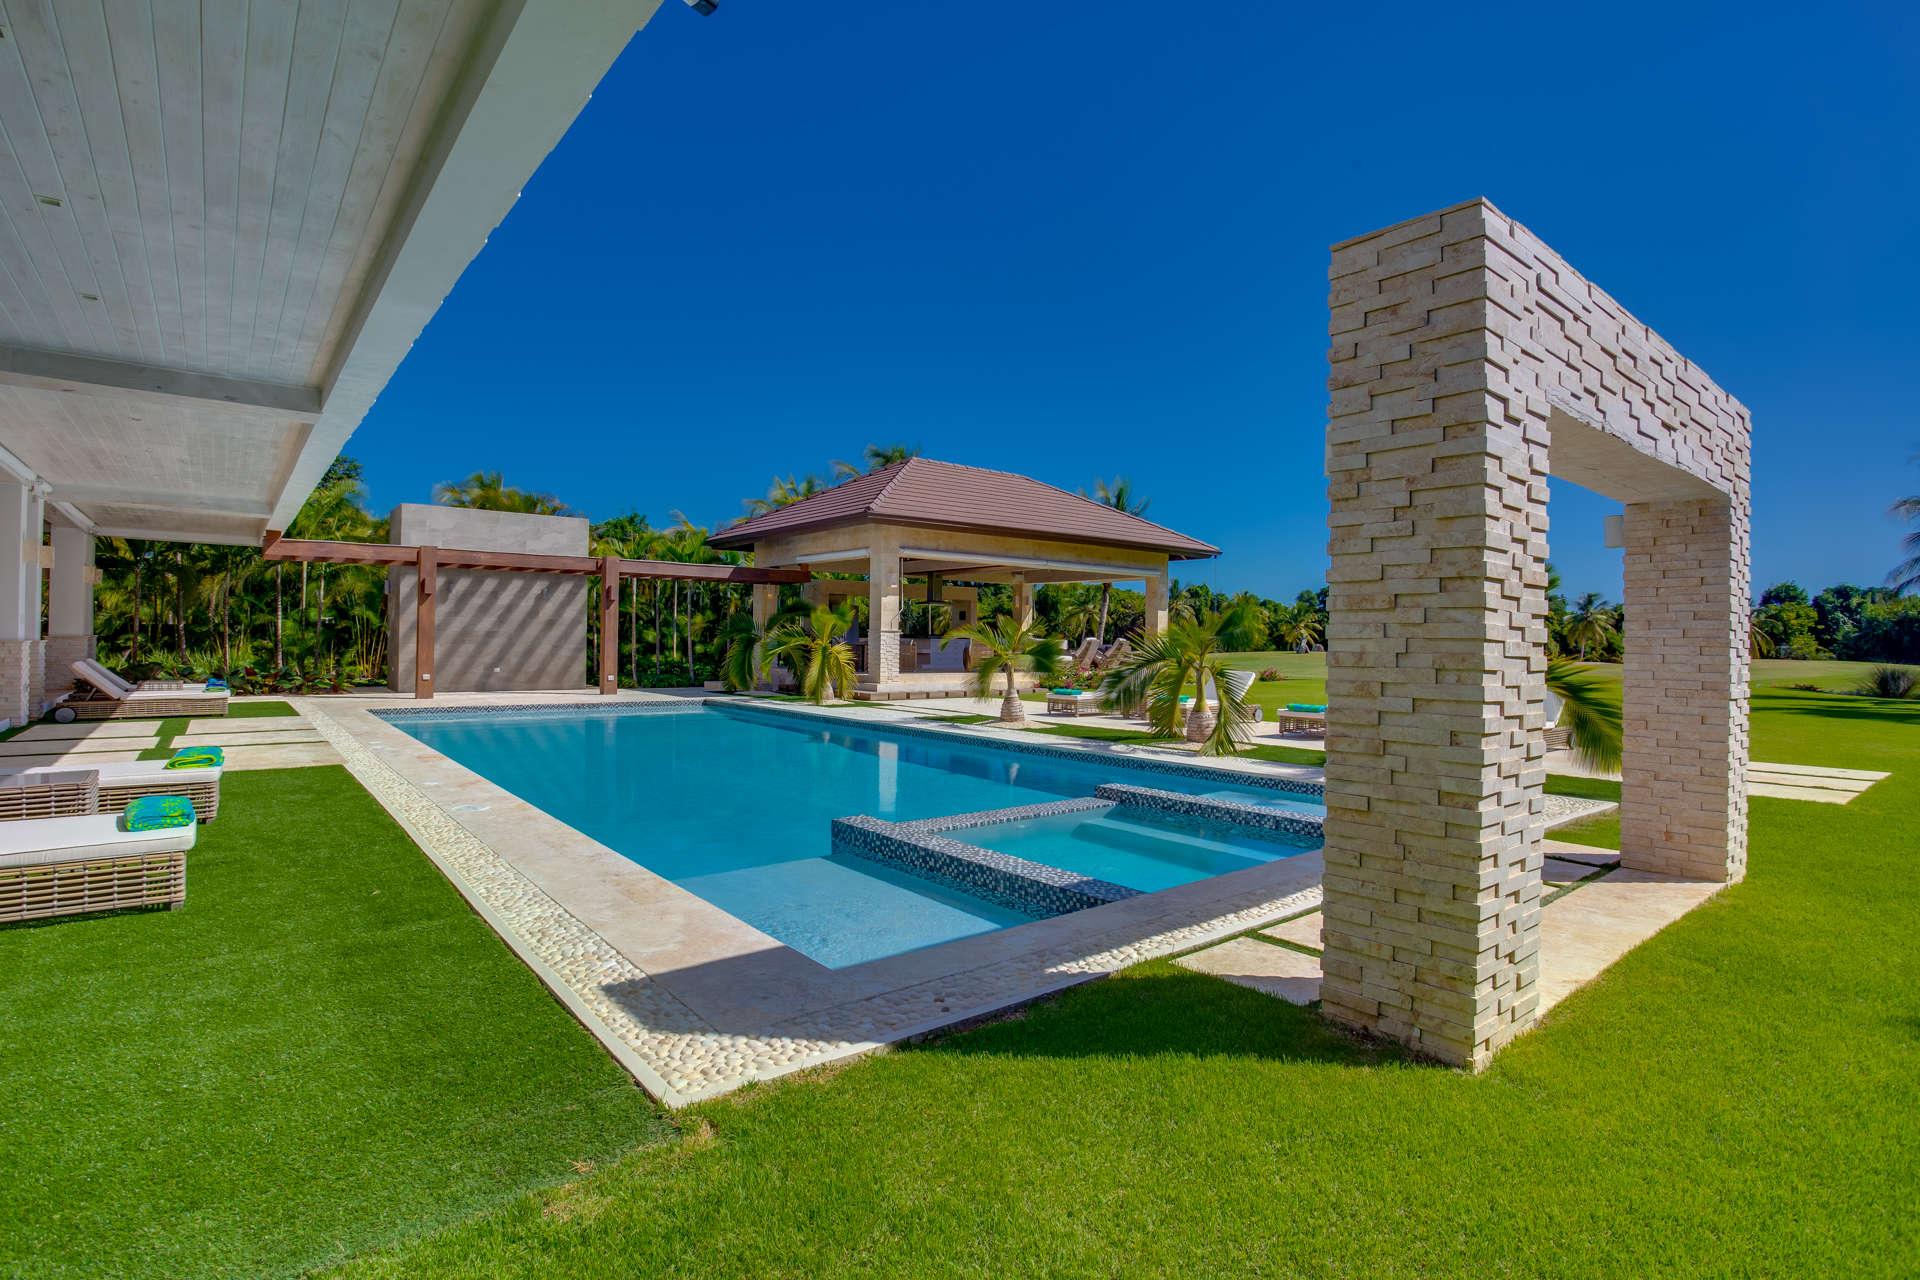 Luxury villa rentals caribbean - Dominican republic - Punta cana - Punta cana resort and club - Blue Star - Image 1/46